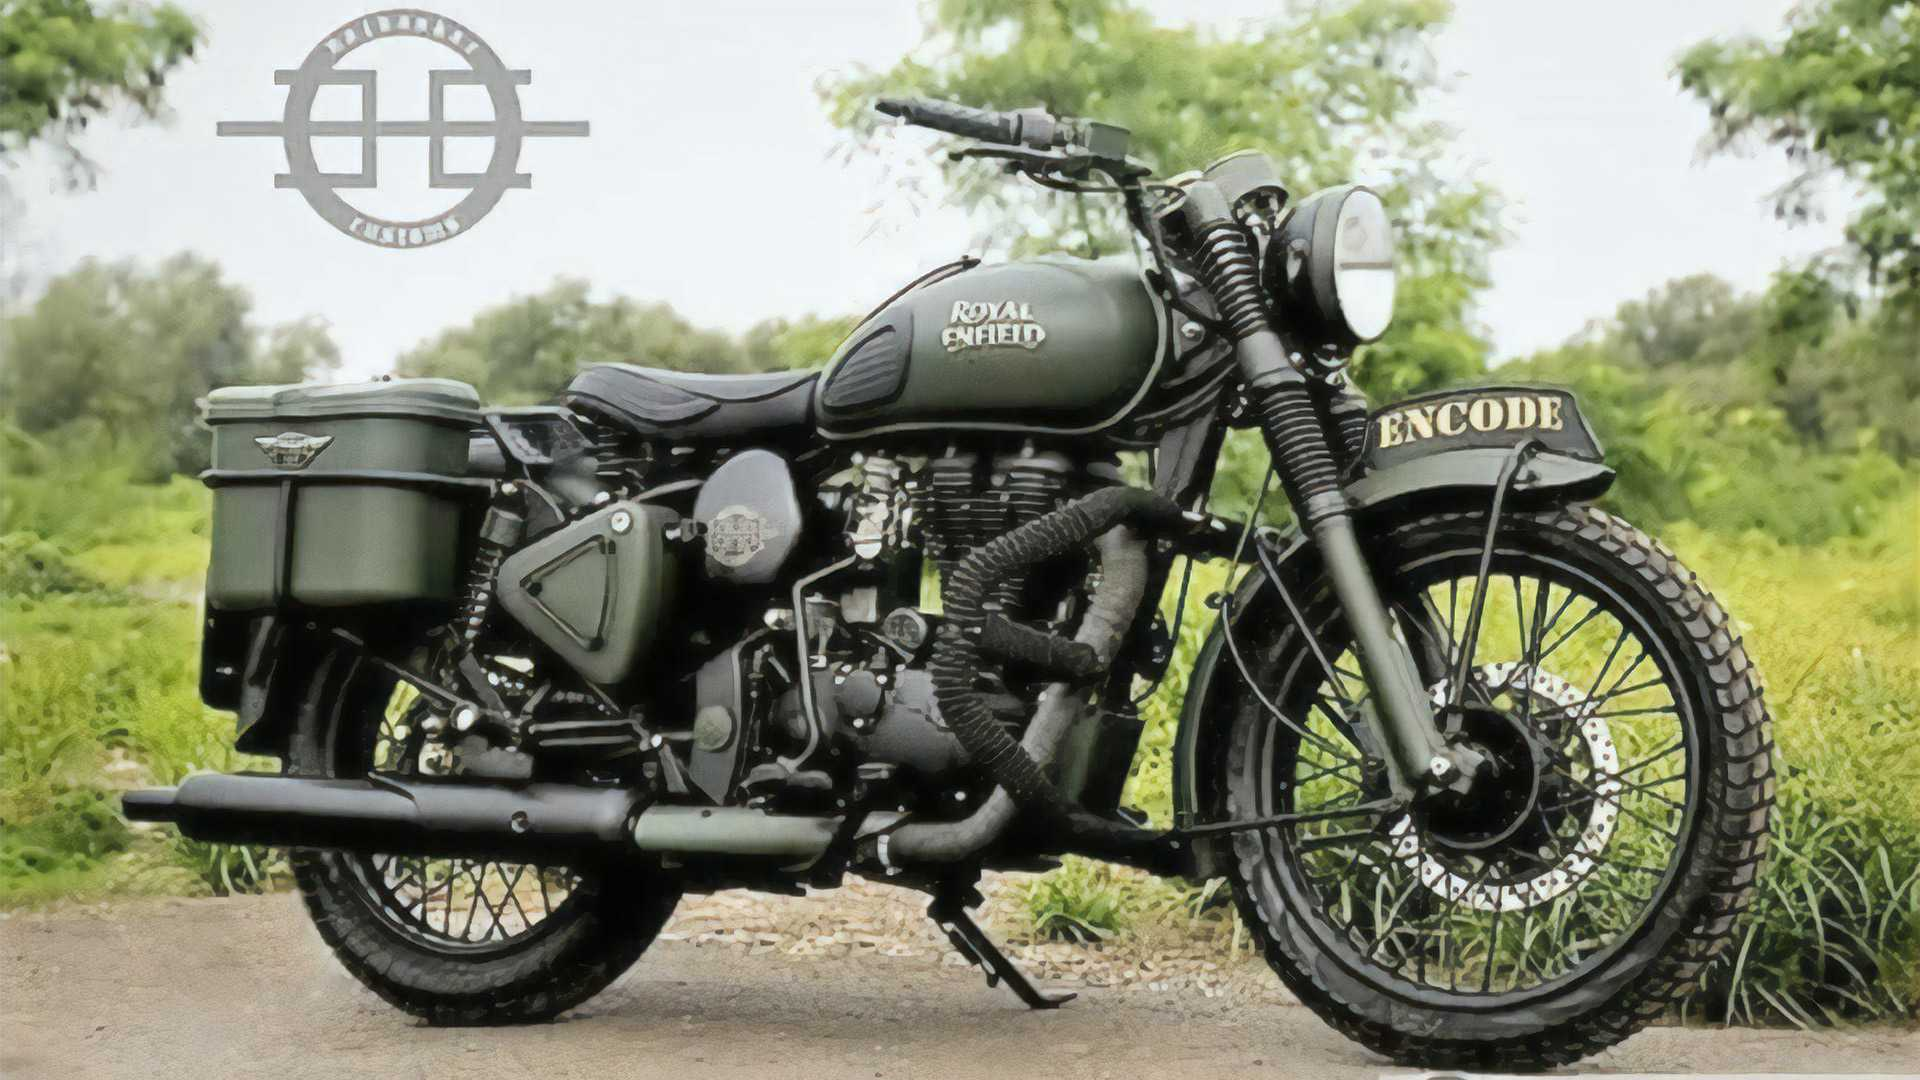 Custom Royal Enfield Classic 350 Encode Looks Like A WW2 Relic